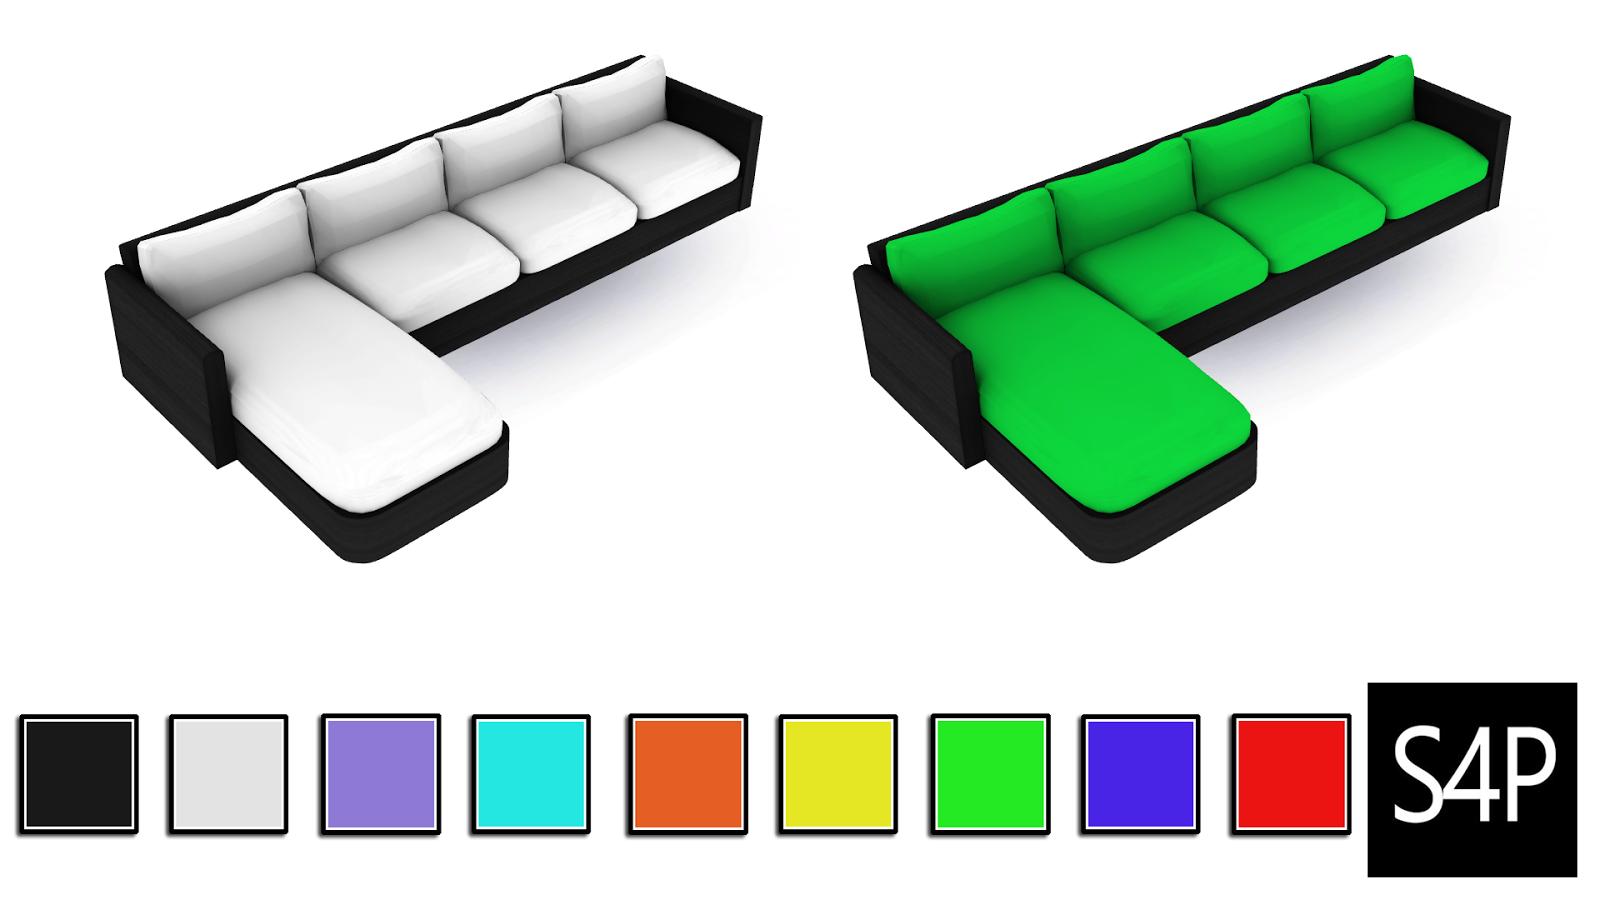 Download Sims 4 Pose Modern Sectional Sofa Mesh Seating